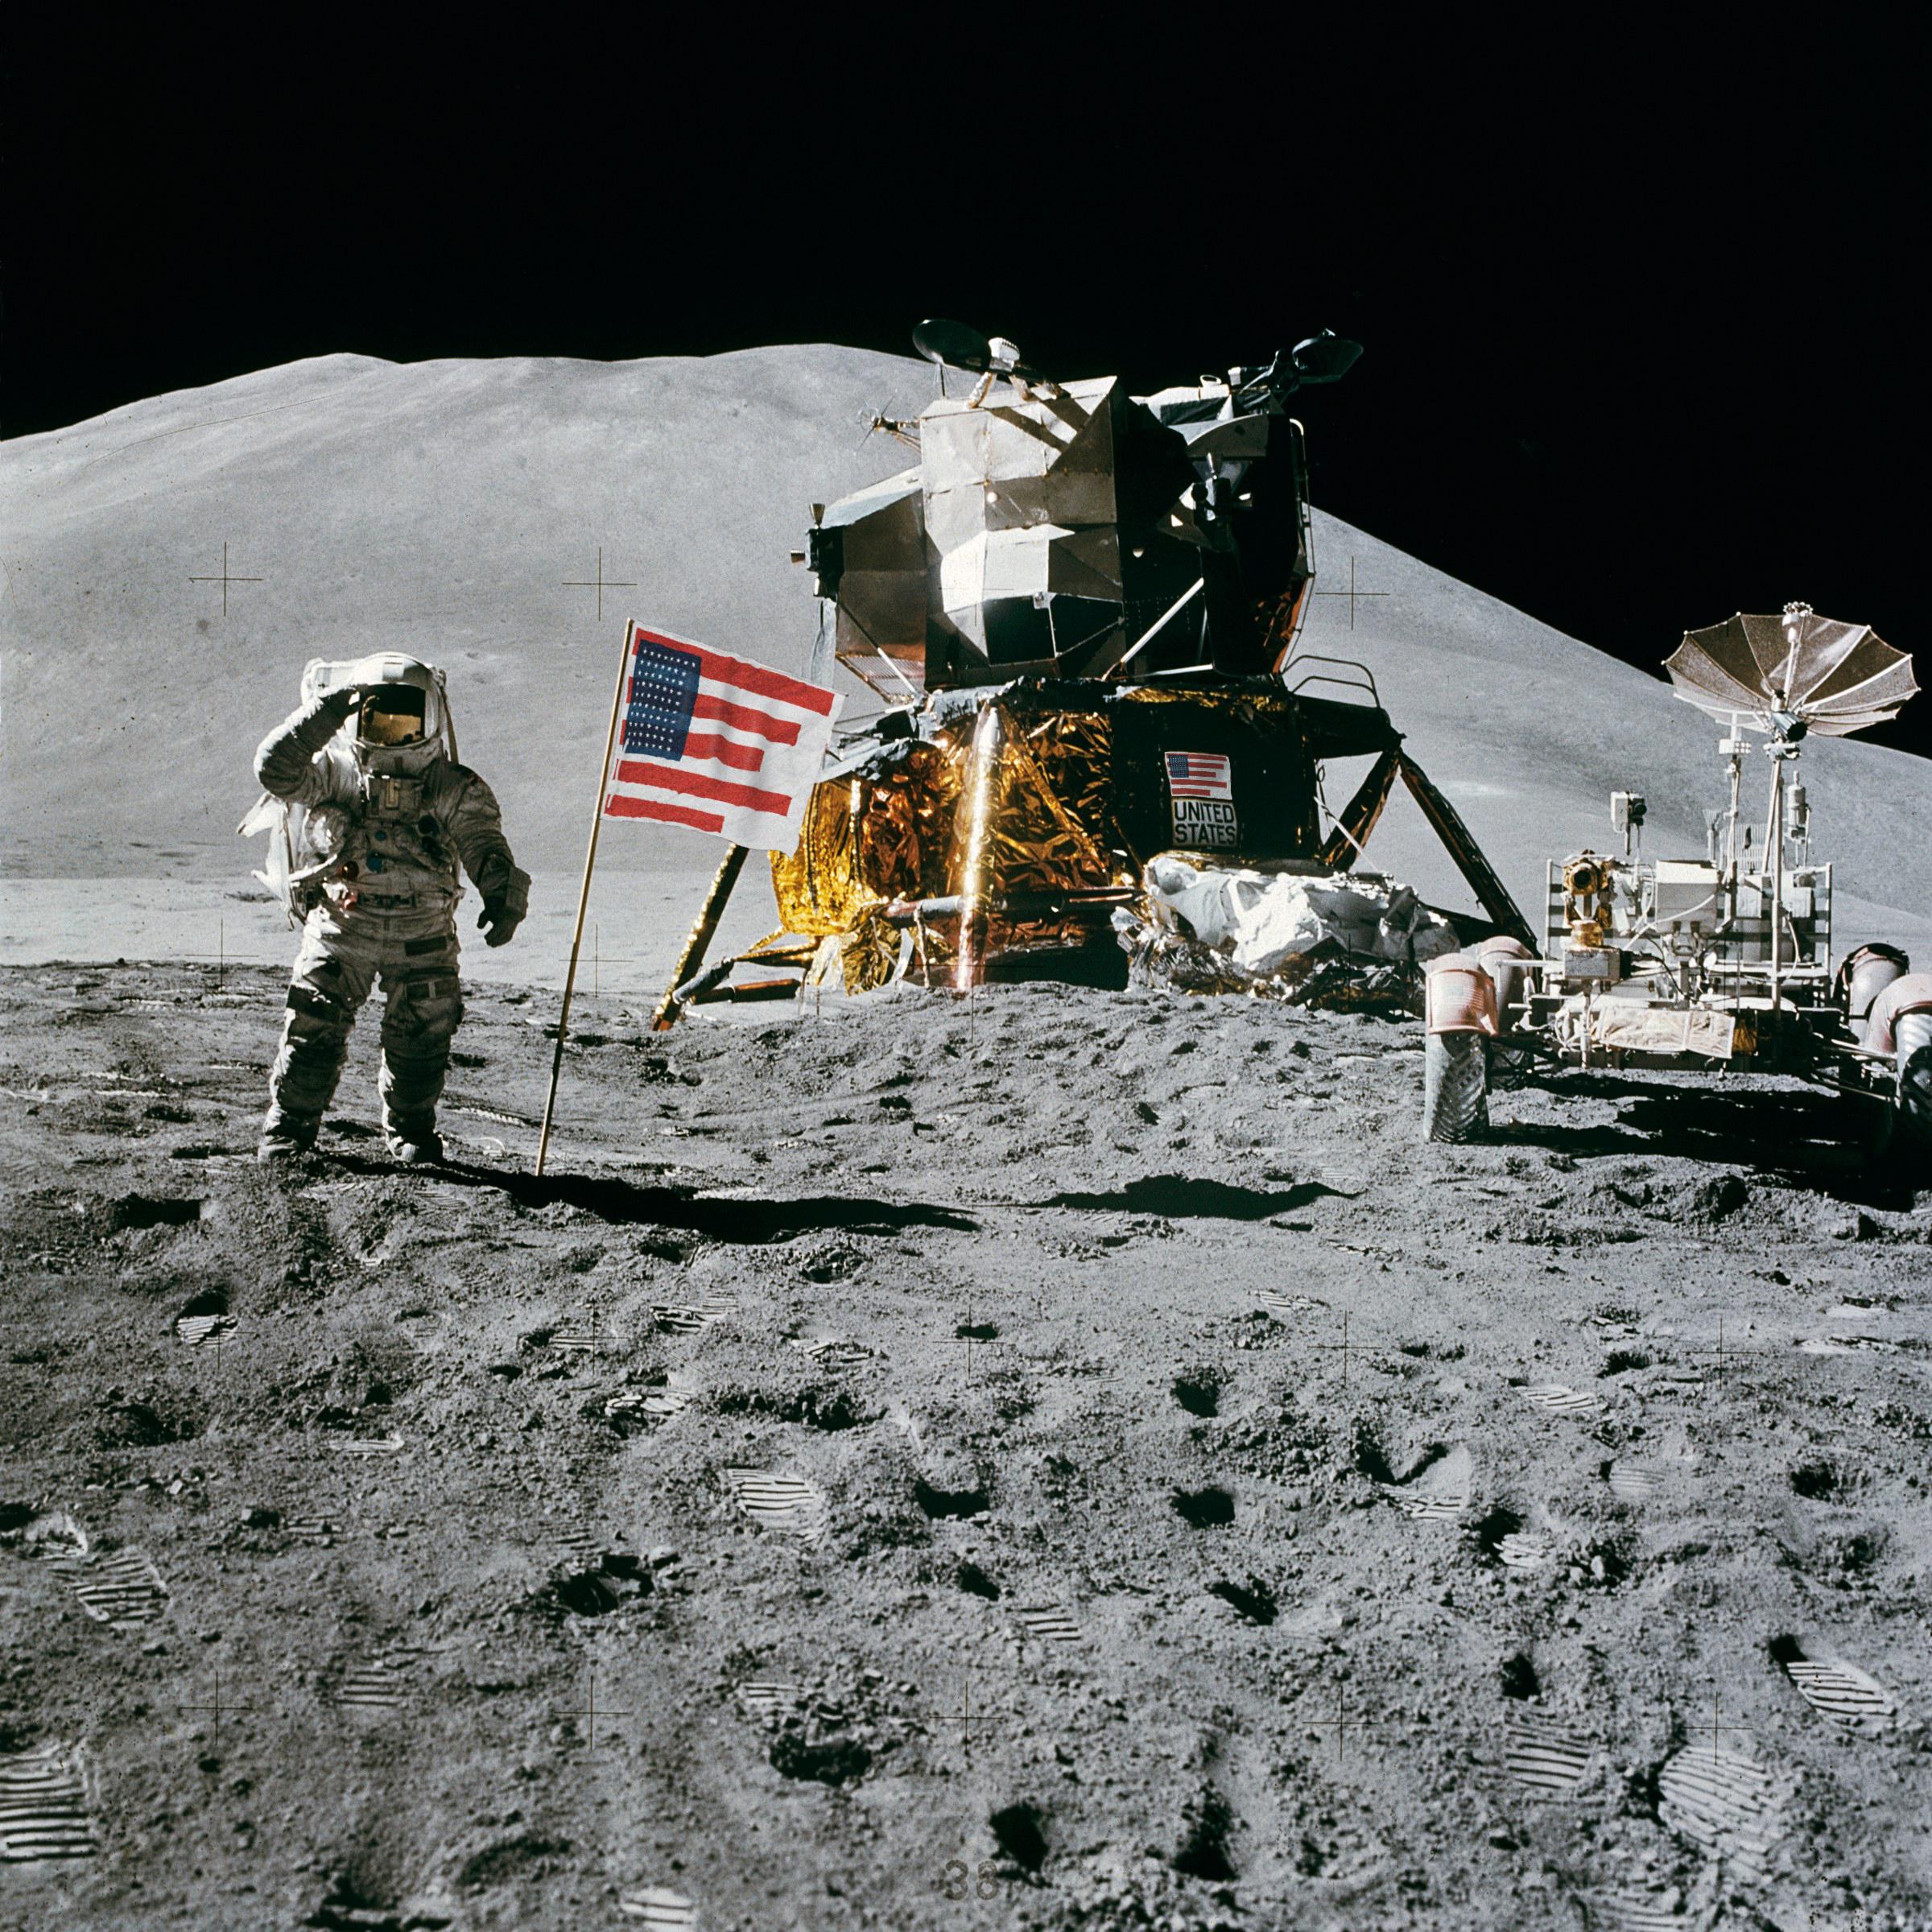 1973 / Apollo 15 moon landing